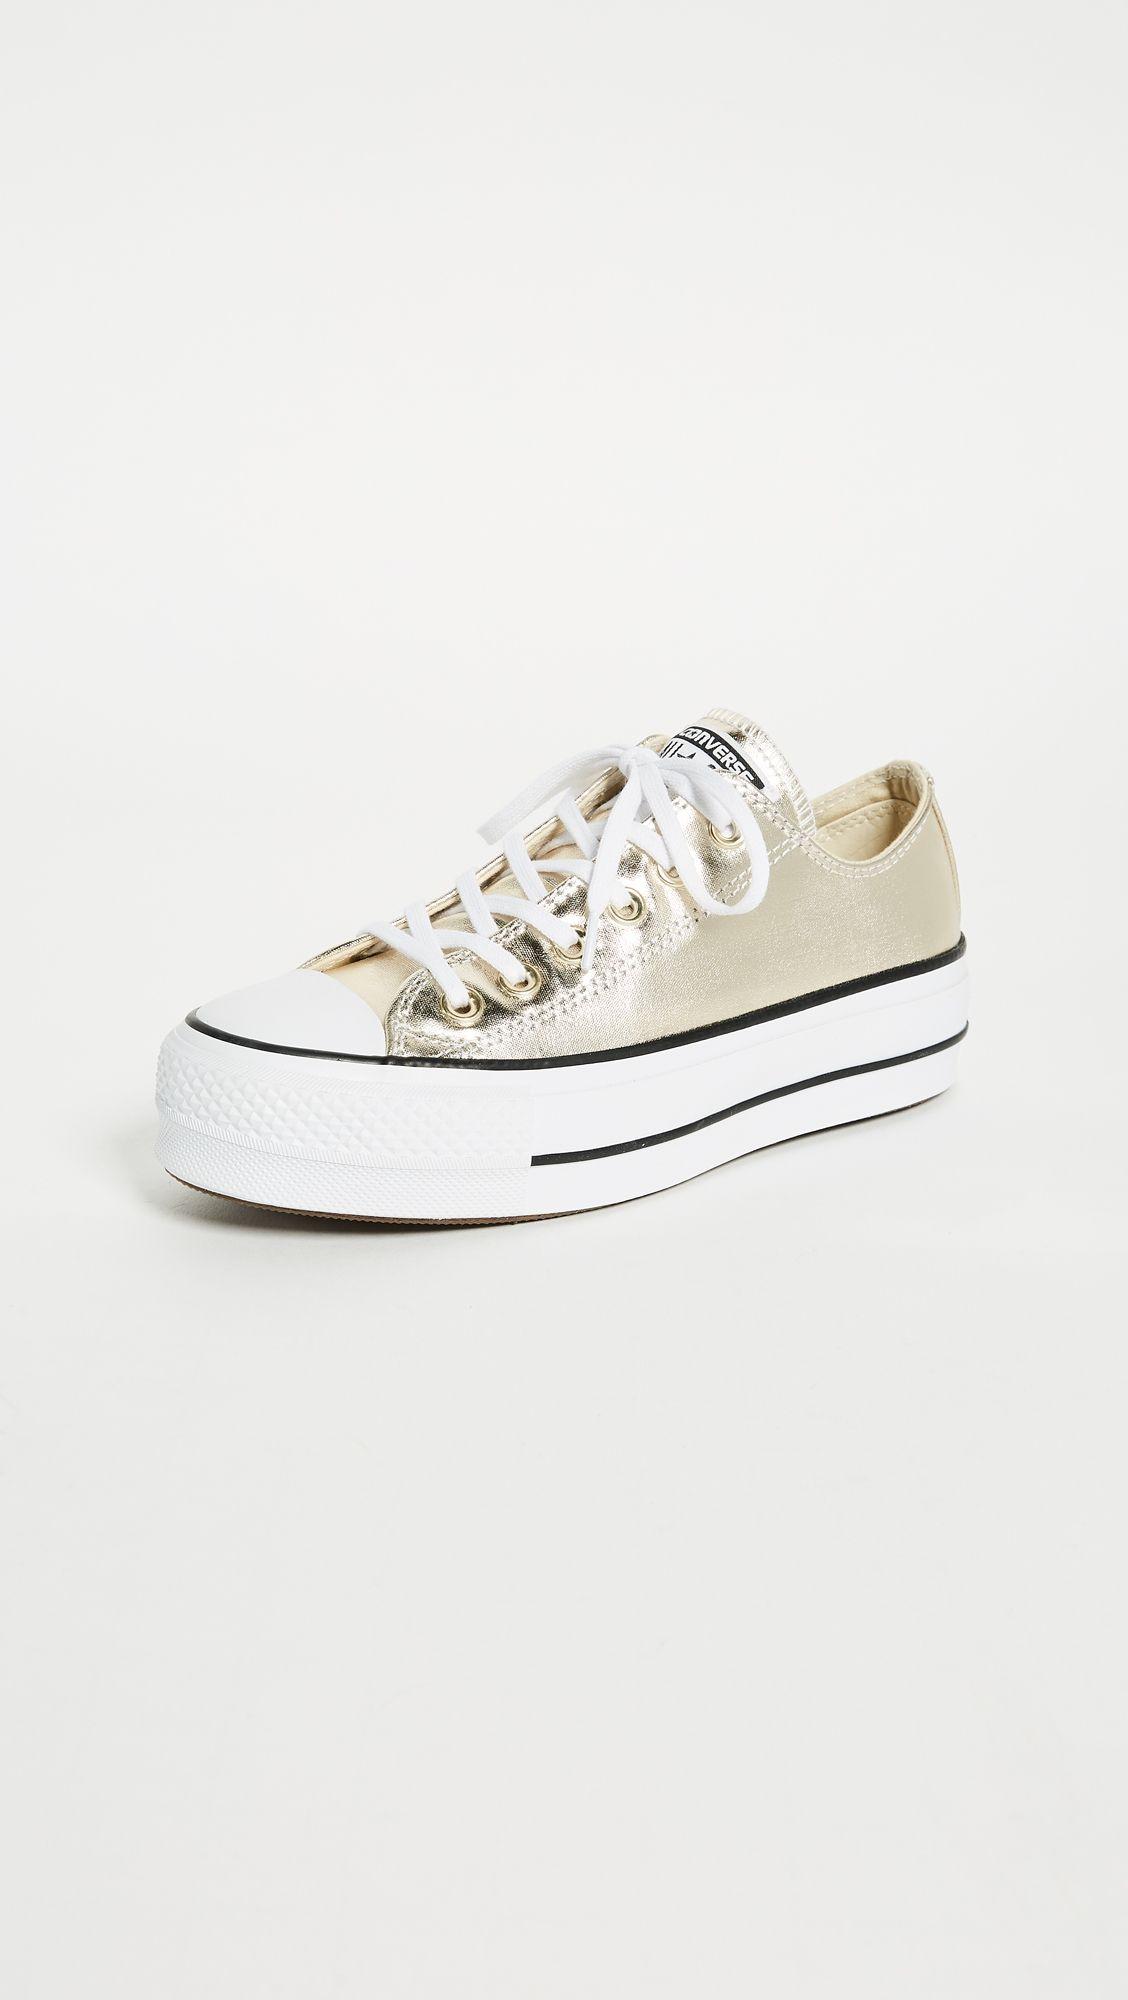 f998589f8a2 Converse Chuck Taylor All Star Lift OX Sneakers